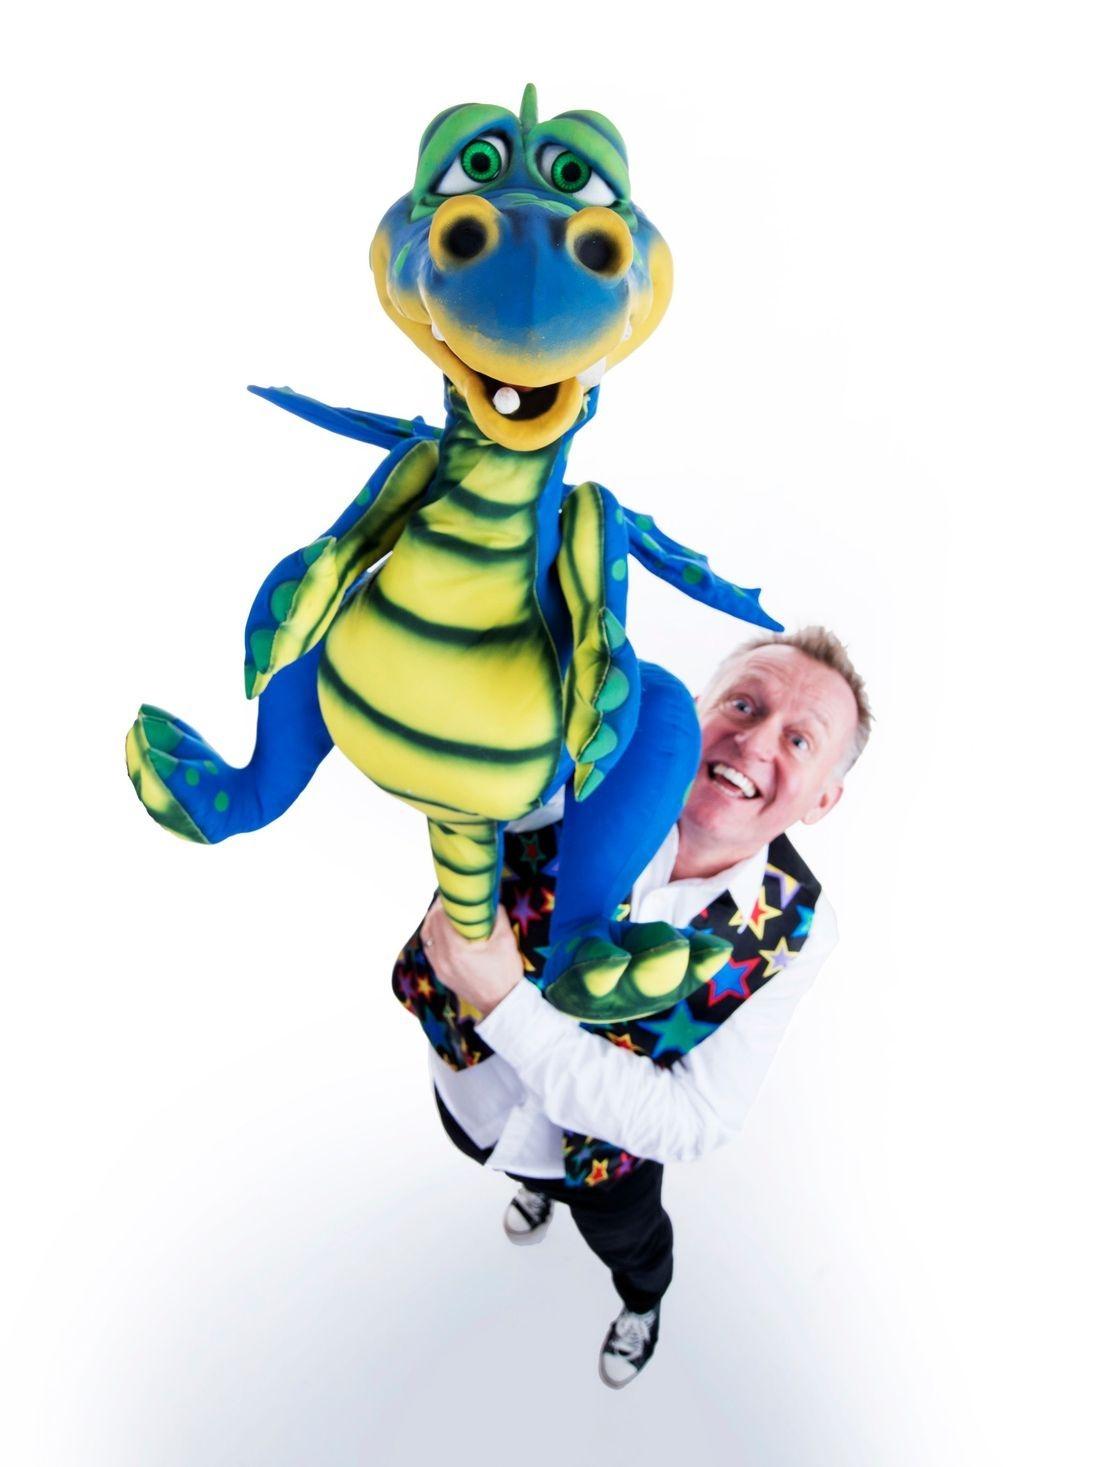 Dizzy Dean's Magic Show Brize Norton Oxfordshire Nov 18